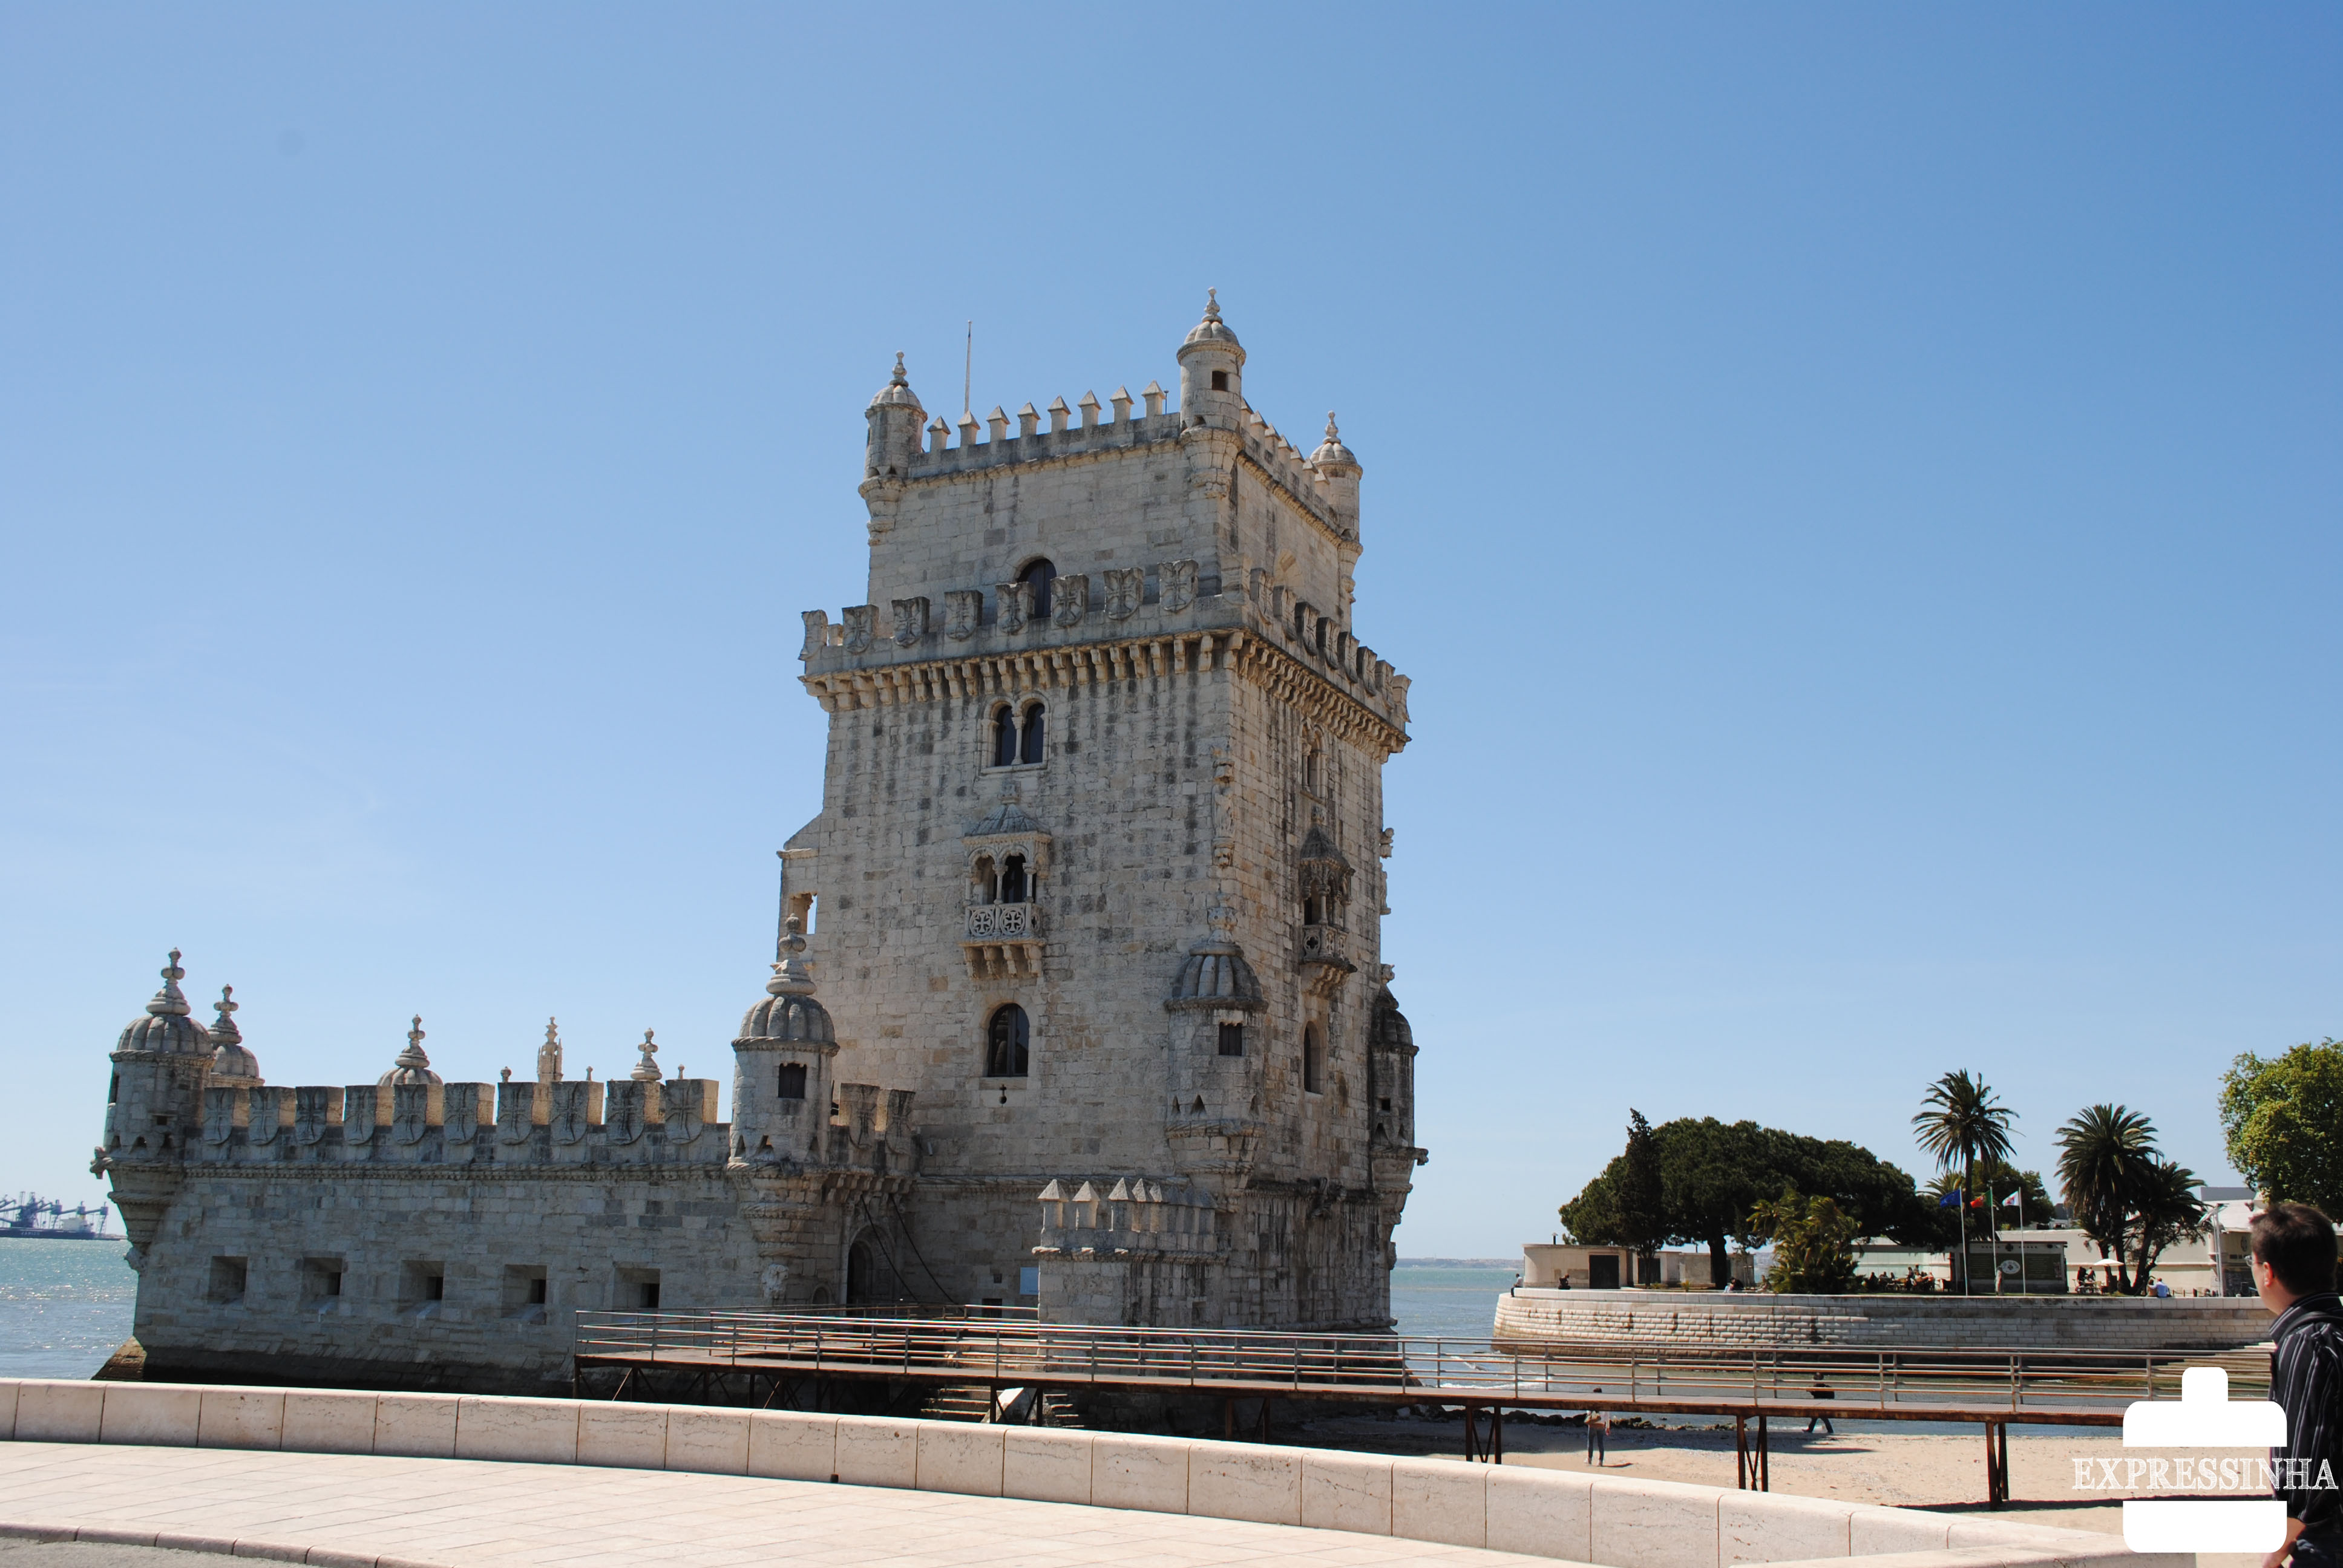 Lisboa, Belém, Torre de Belém